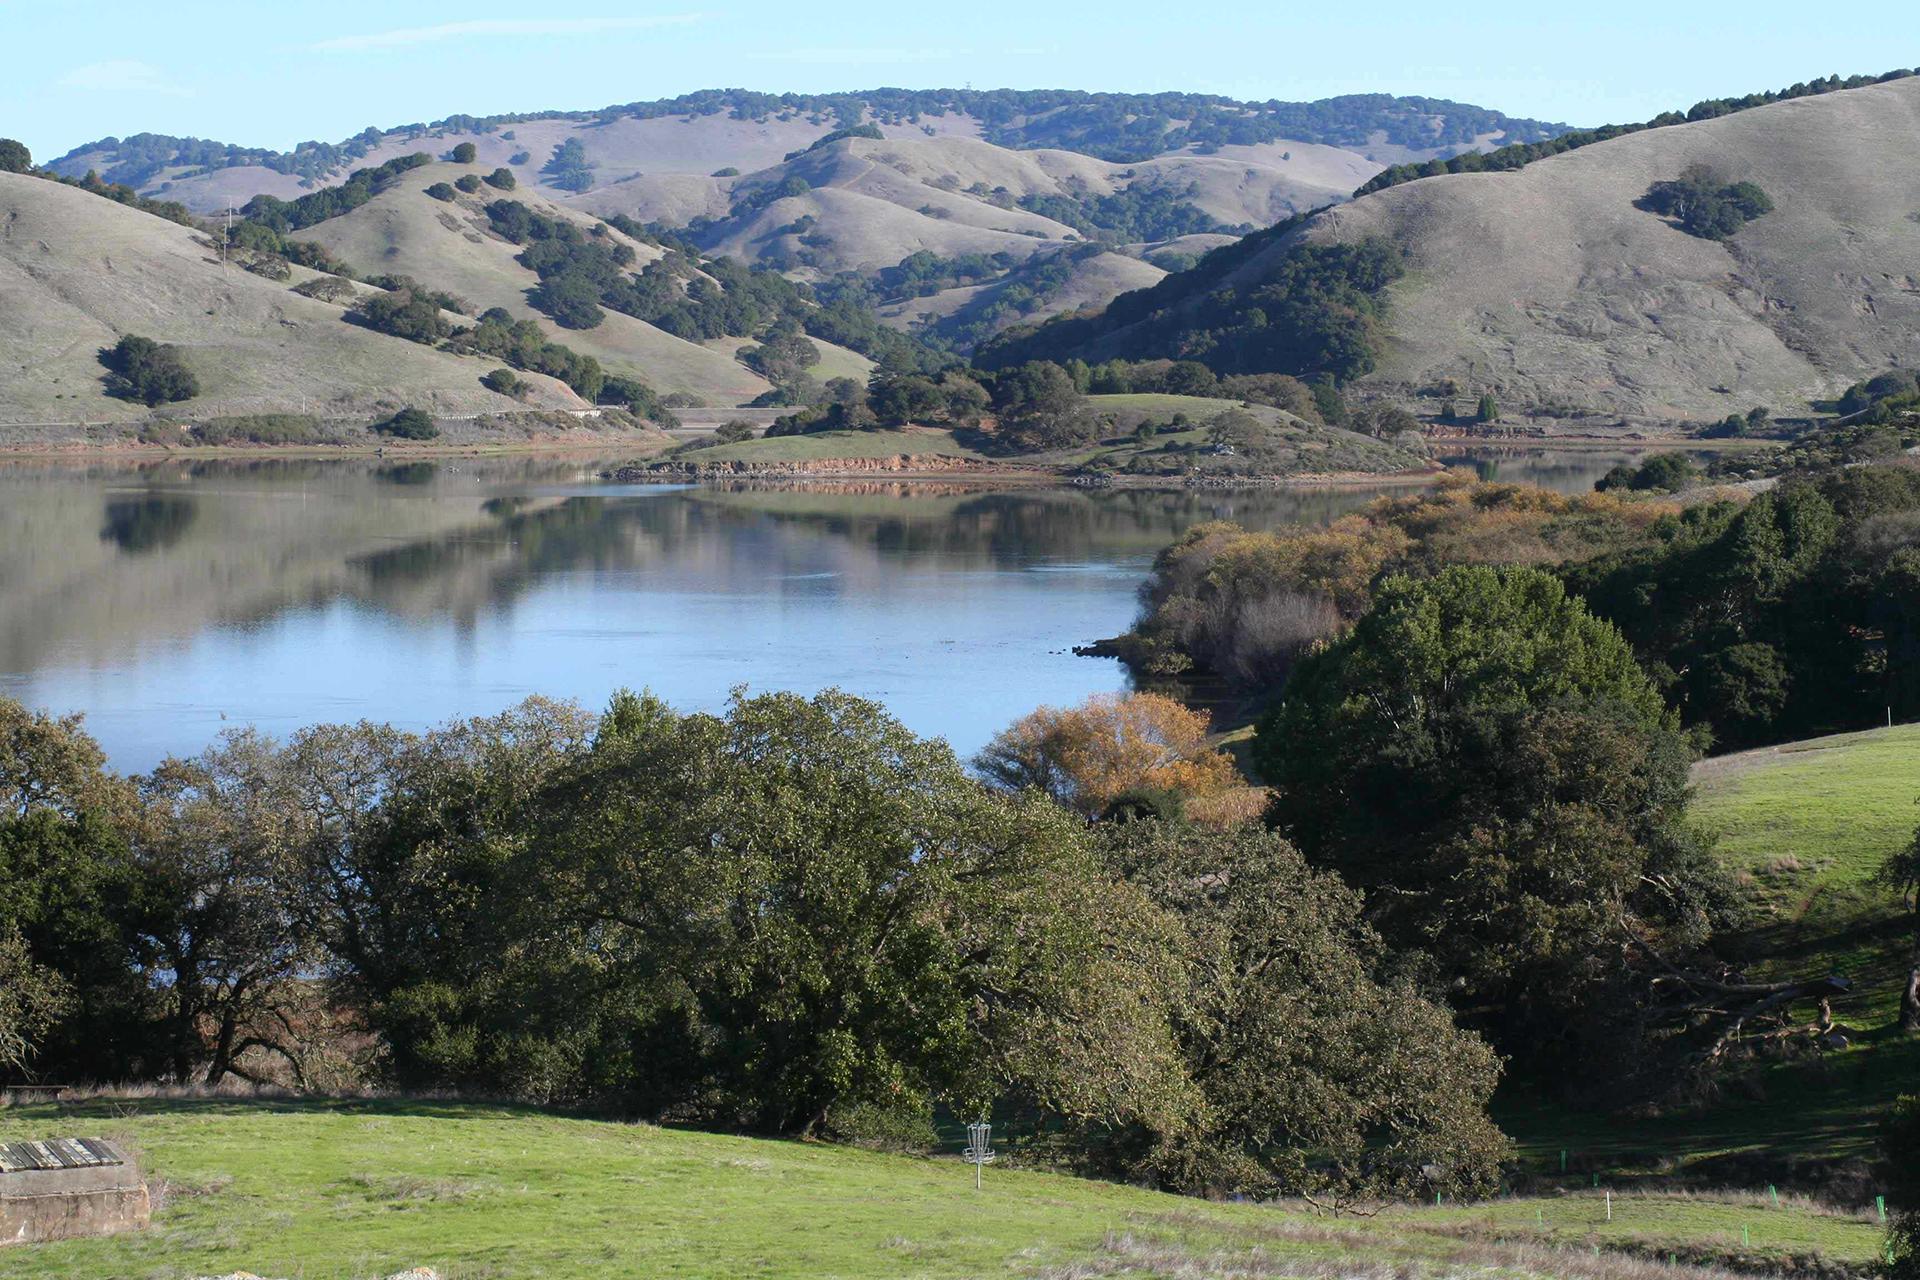 Stafford Lake - Marin County, CA